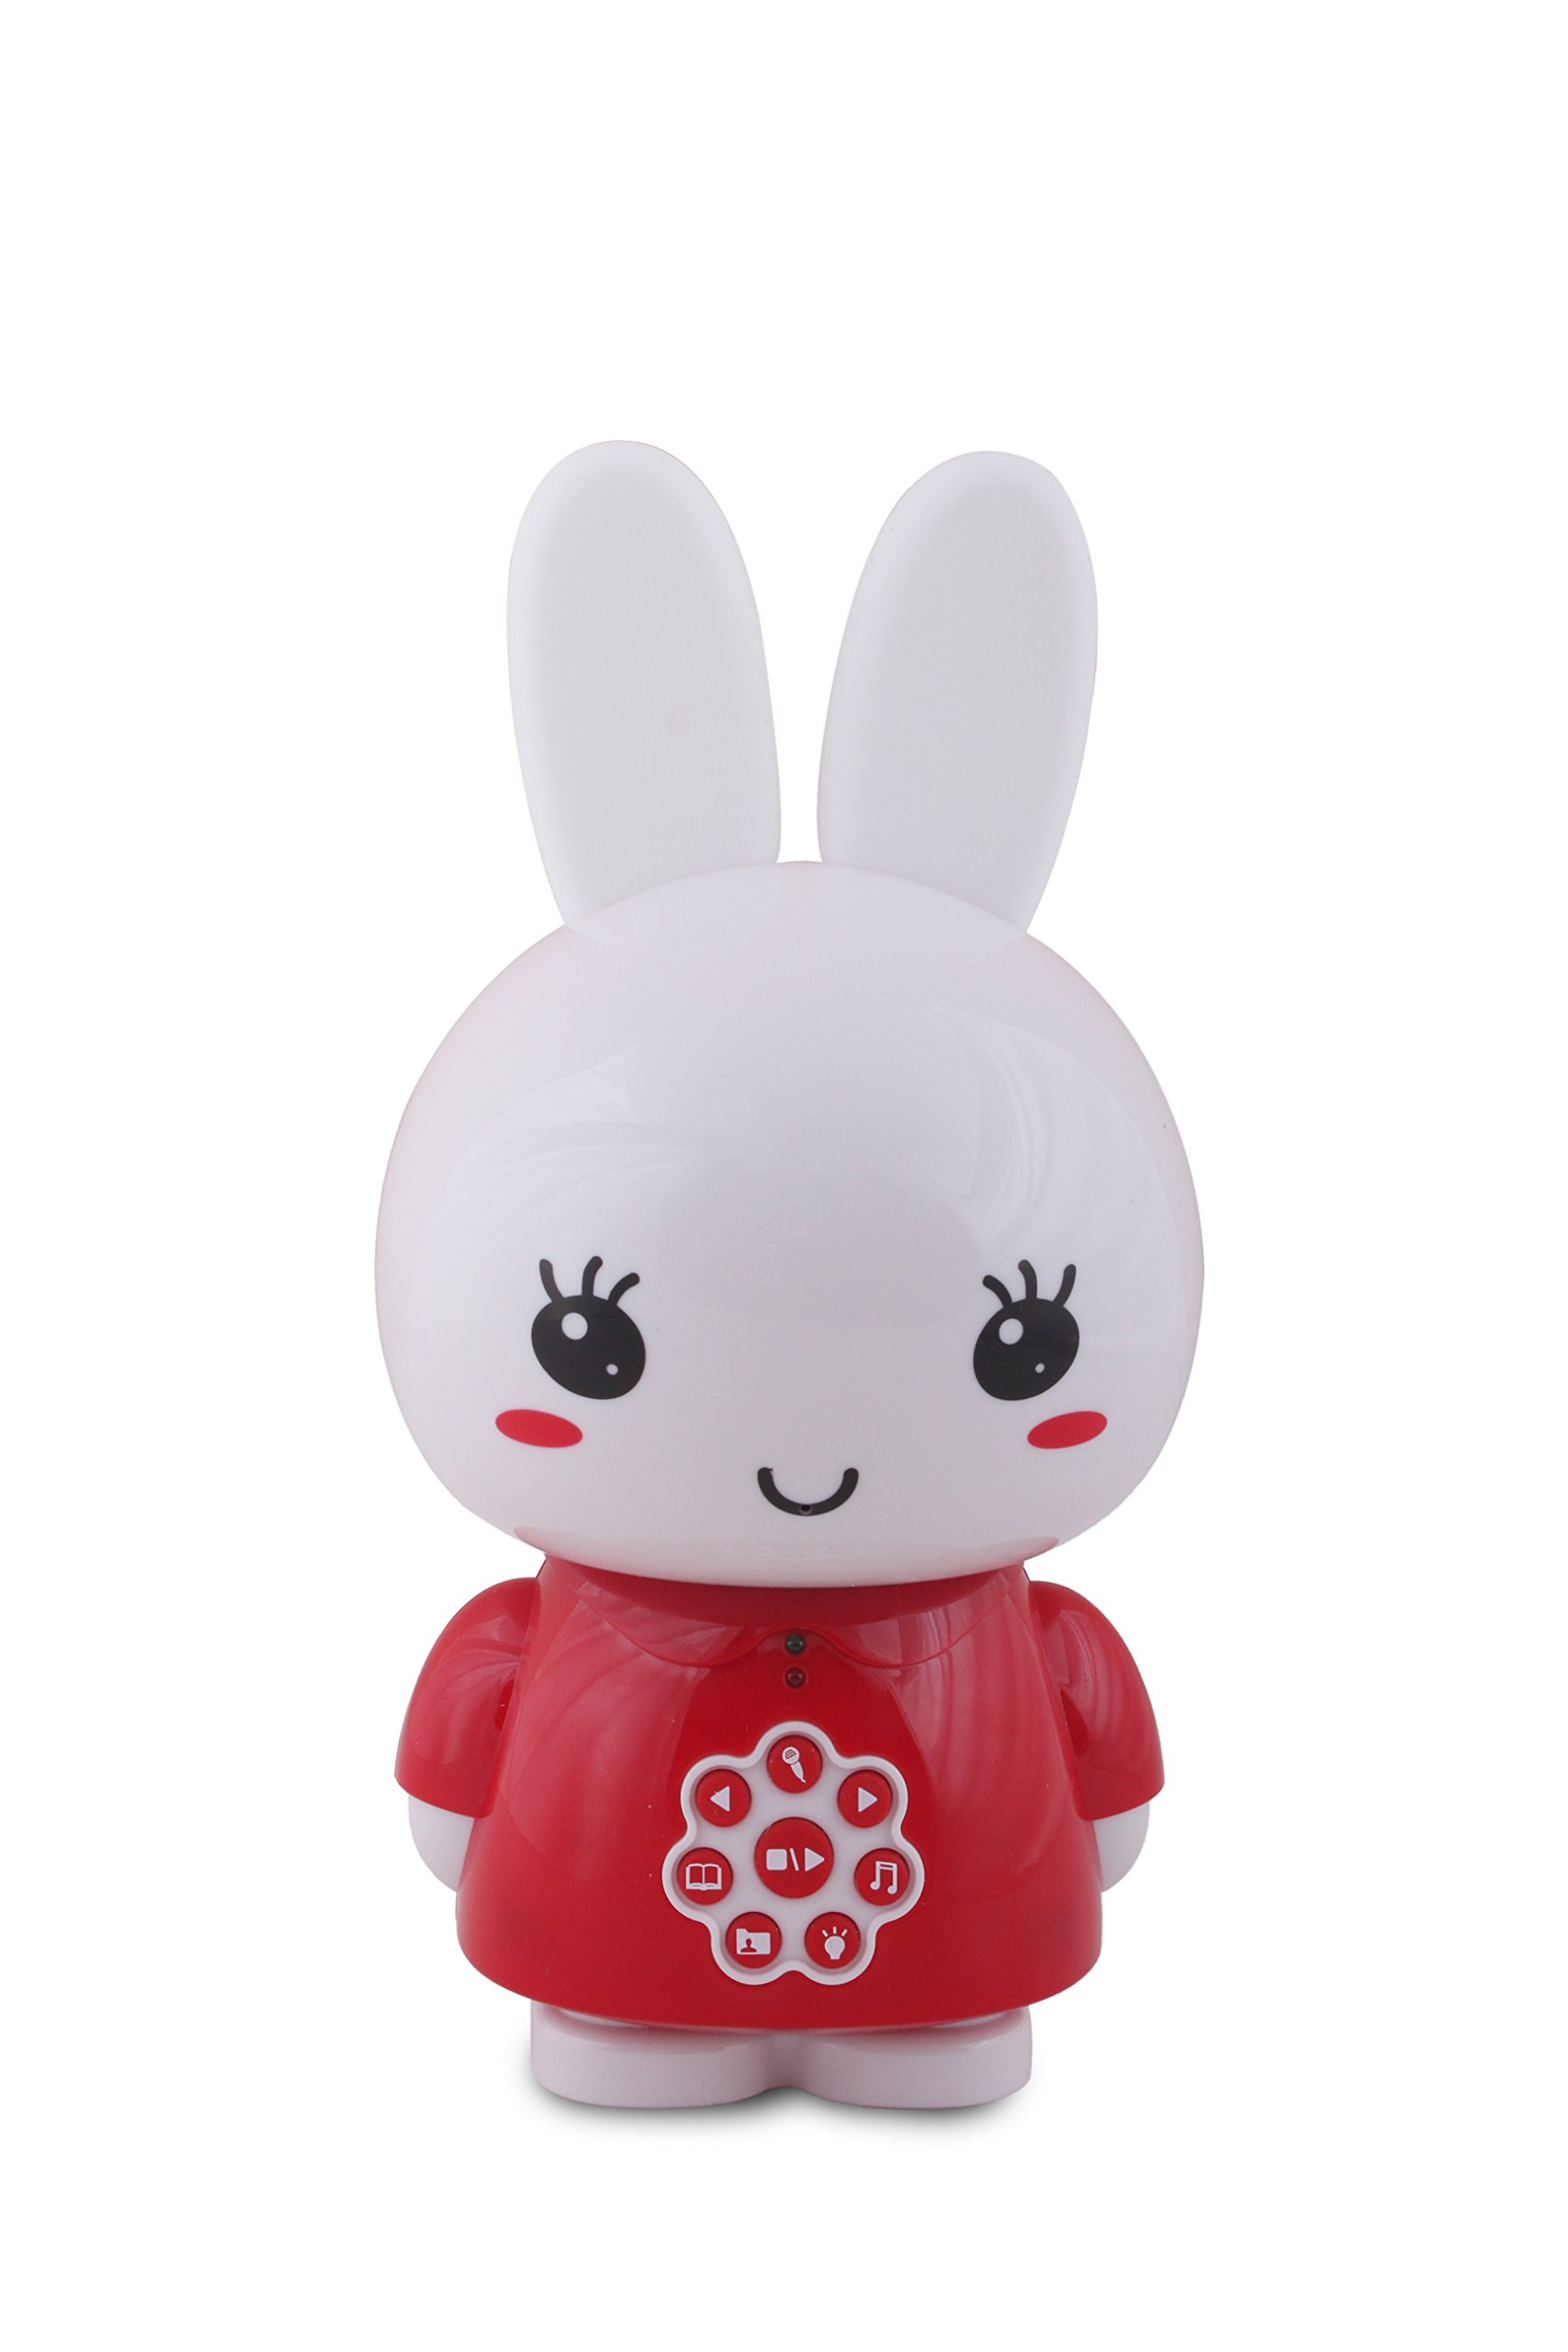 Alilo G6 Honey Bunny 4GB Children's Digital Player, Red